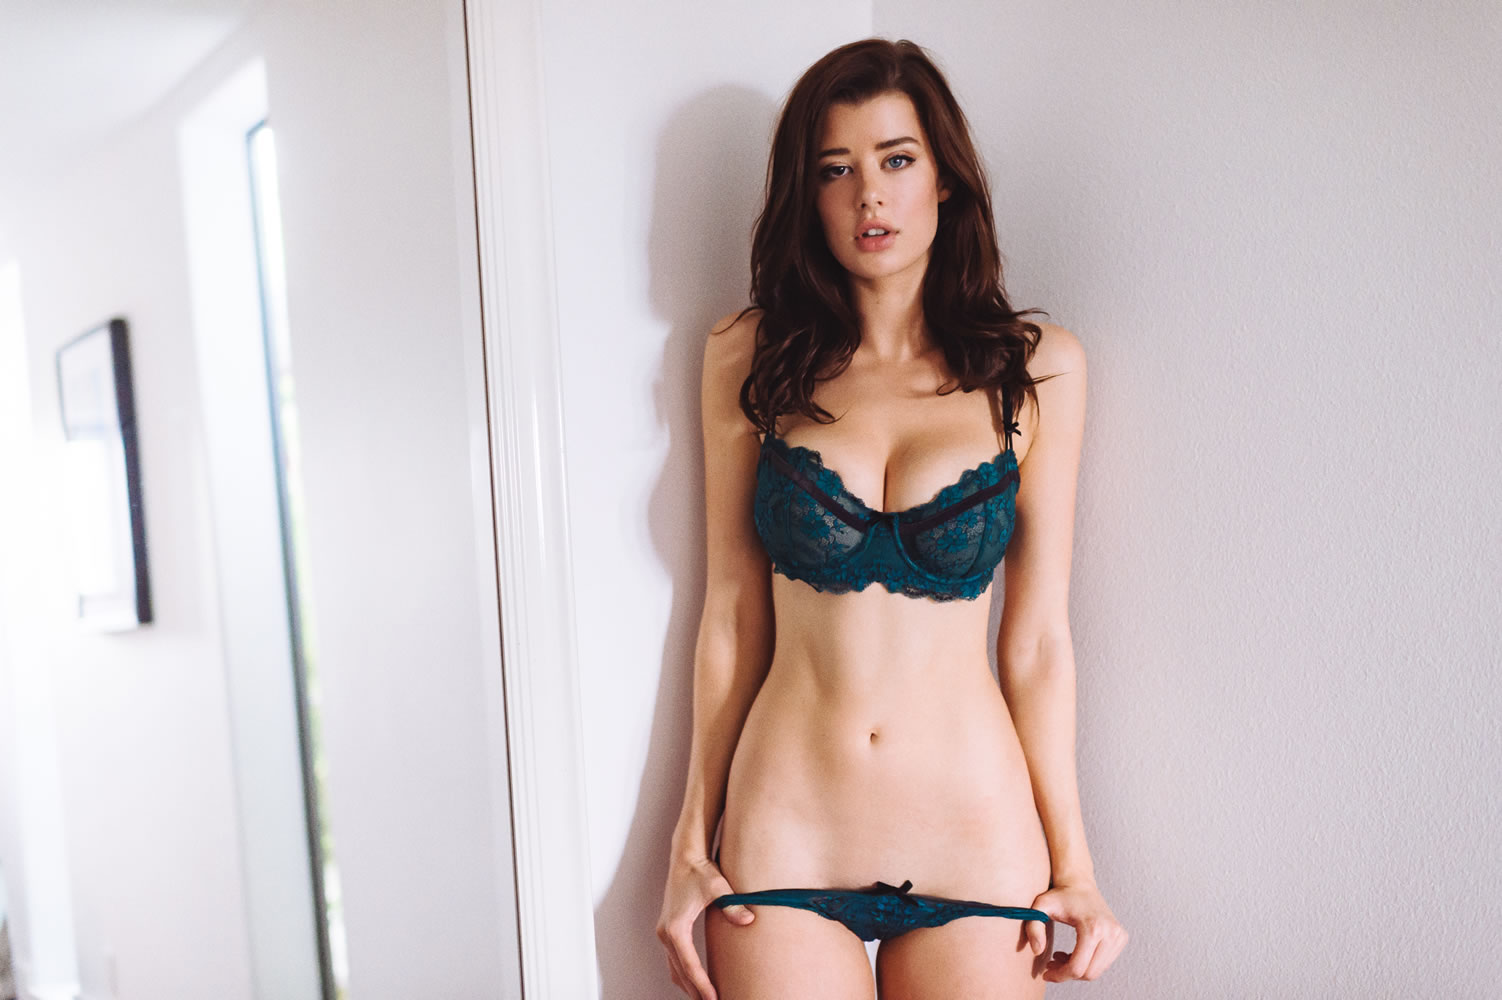 Selfie Samantha Fox naked (18 photos), Sexy, Sideboobs, Boobs, braless 2019